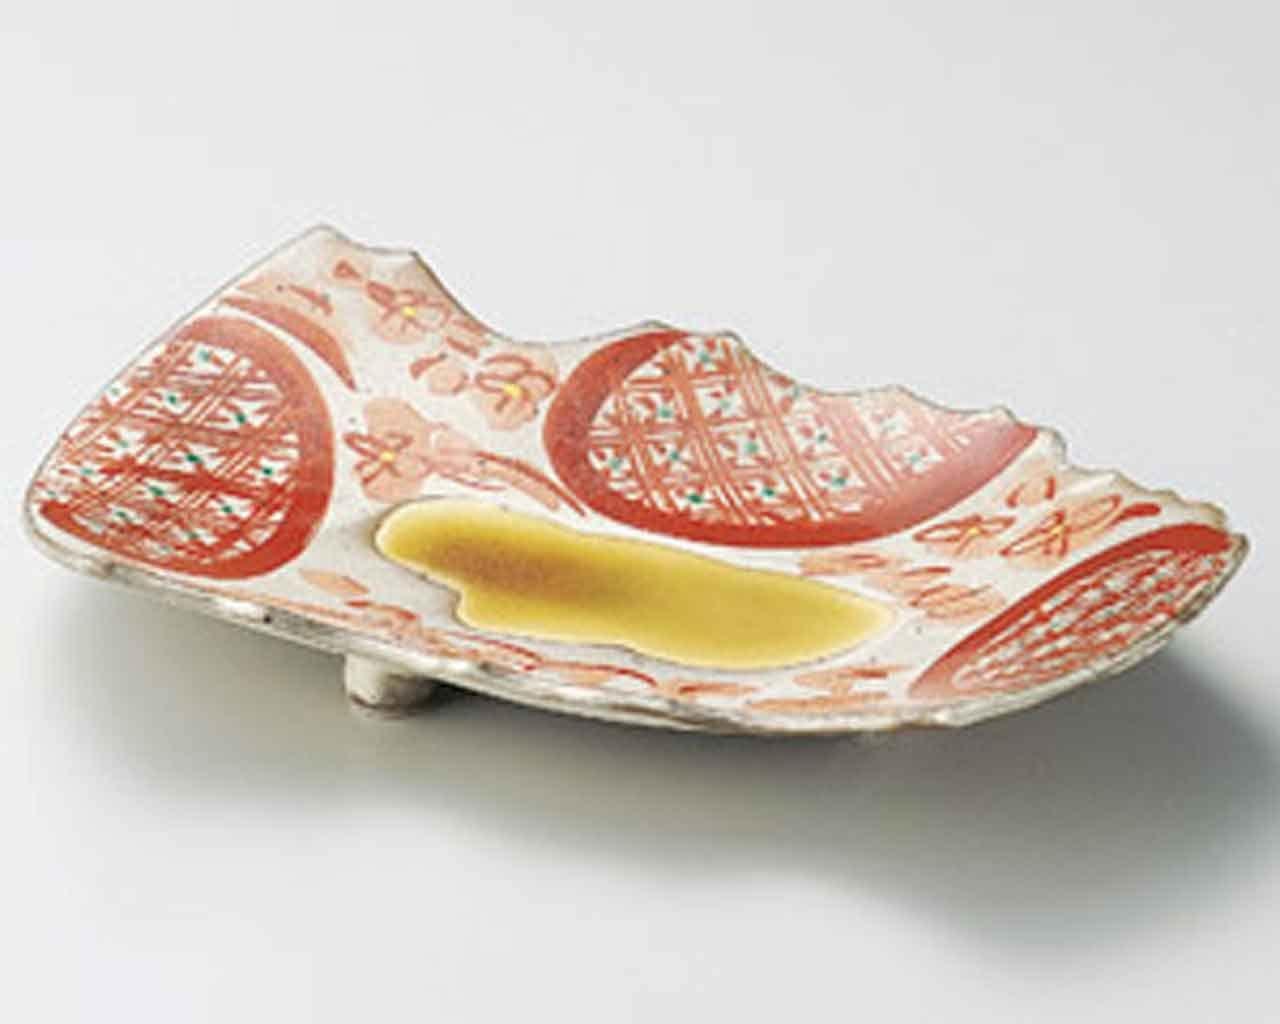 Akae Flower 11.6inch Set of 5 Medium Plates Beige Ceramic Made in Japan